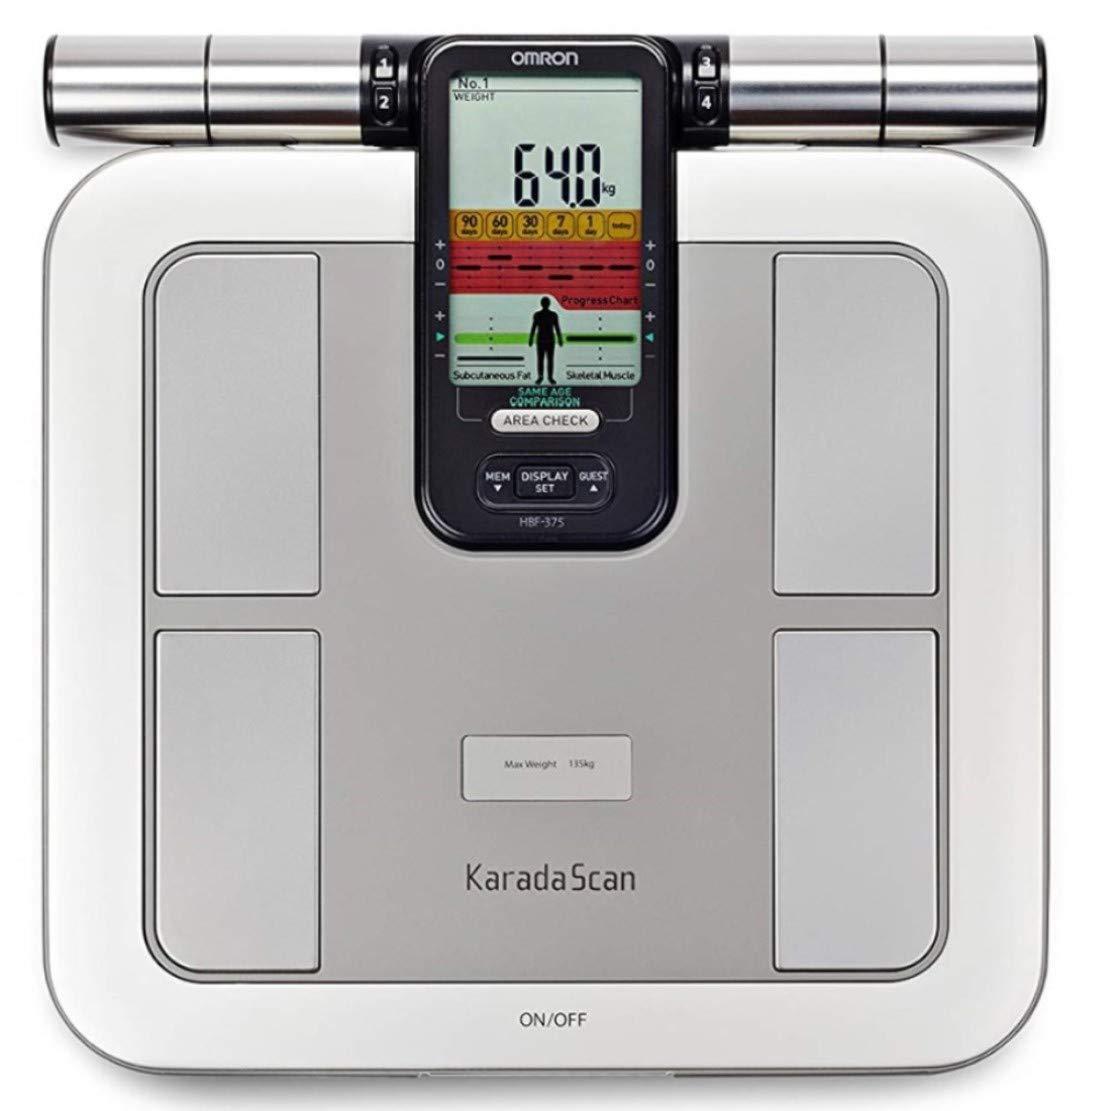 Omron Karada smart weighing scale